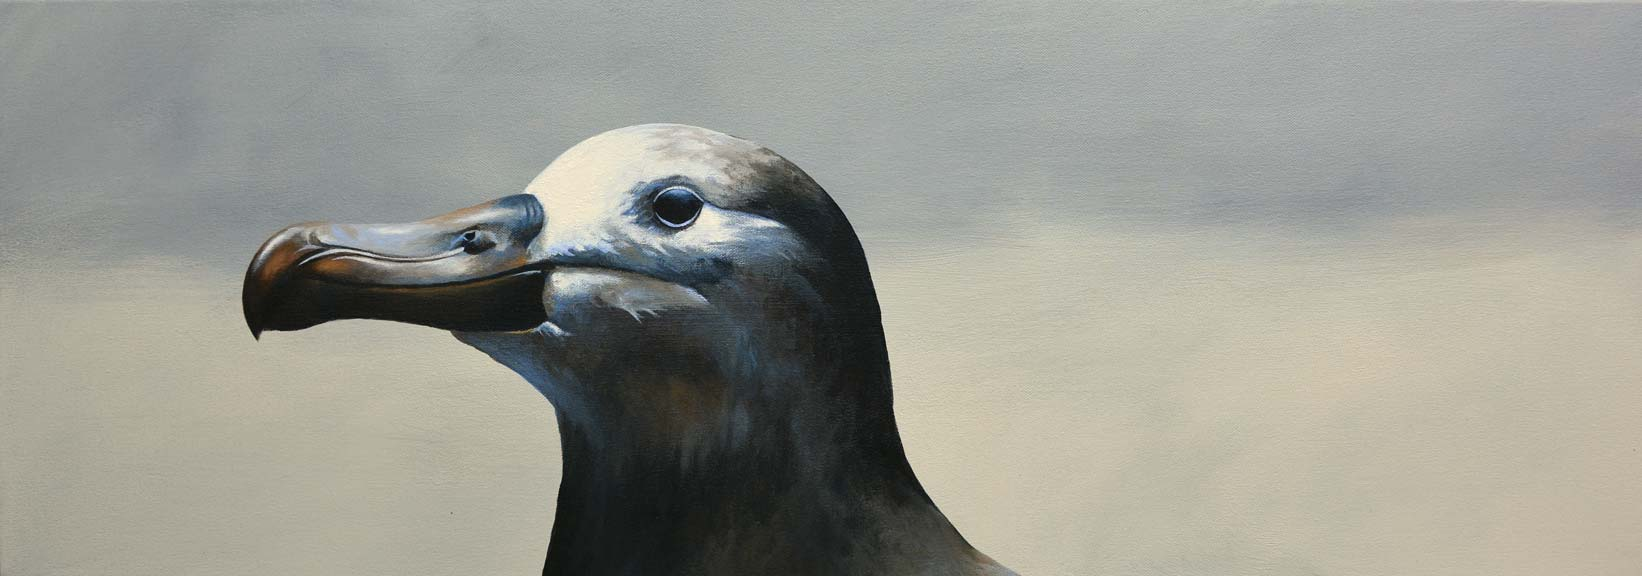 albatross_web.jpg